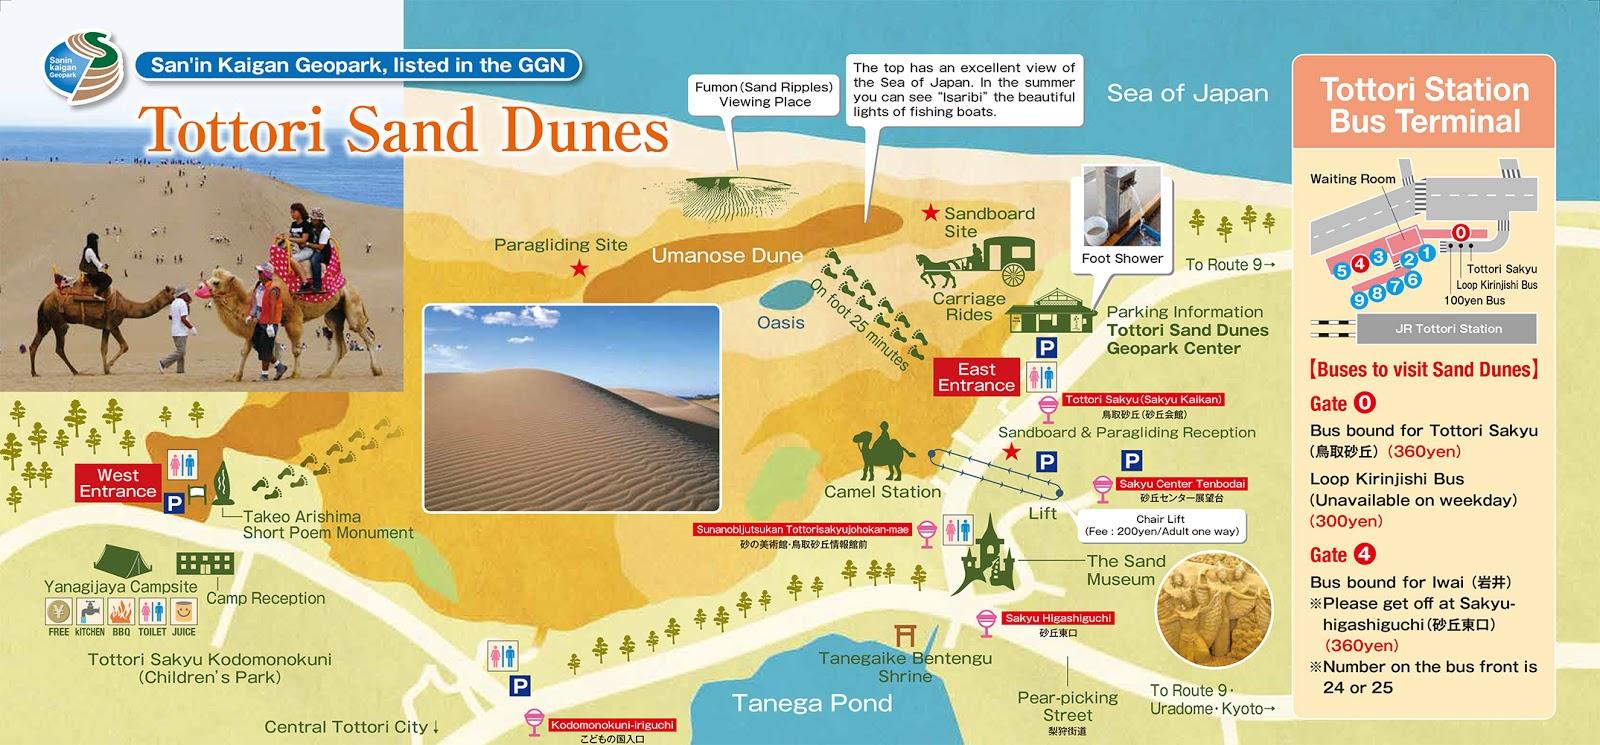 Tottori Sand Dunes - Tottori, Japan   Blue Moon (Travel Blog; Self travel / Backpack / One Day Trip)